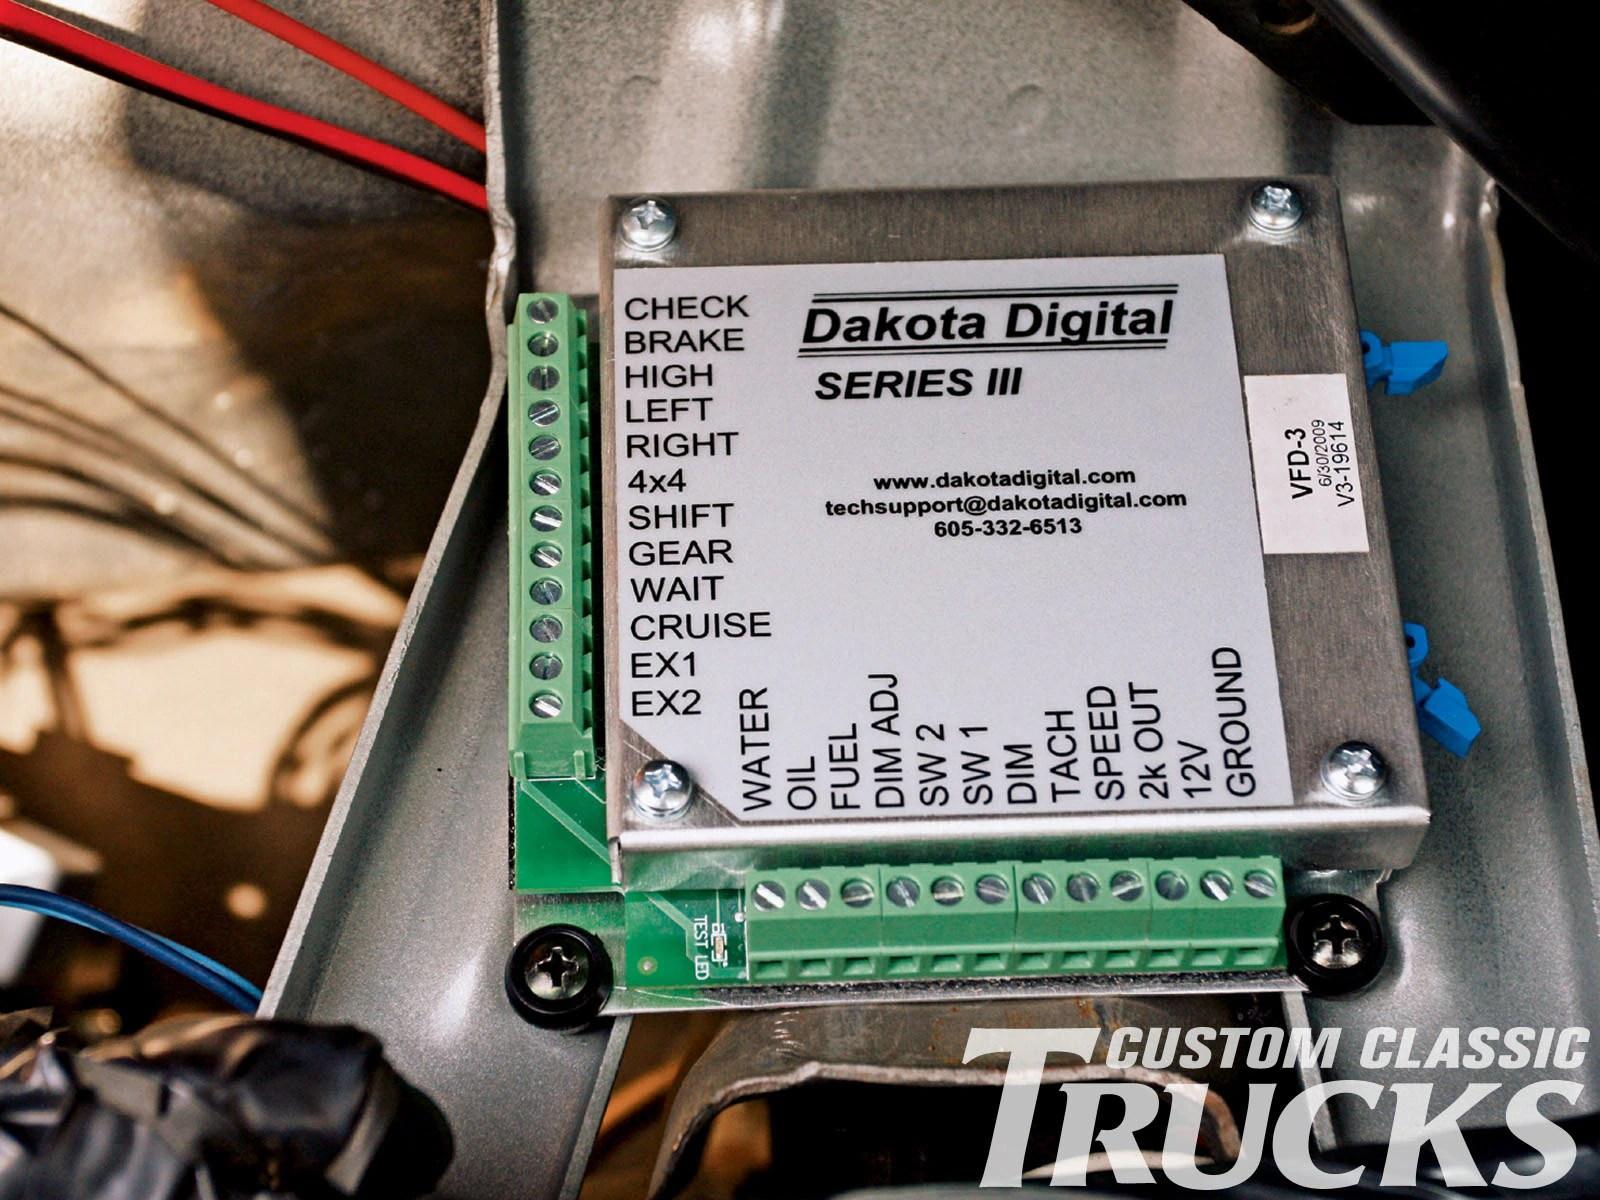 dakota digital wiring diagram 1979 corvette 1973 1987 chevy c10 and gmc truck gauge